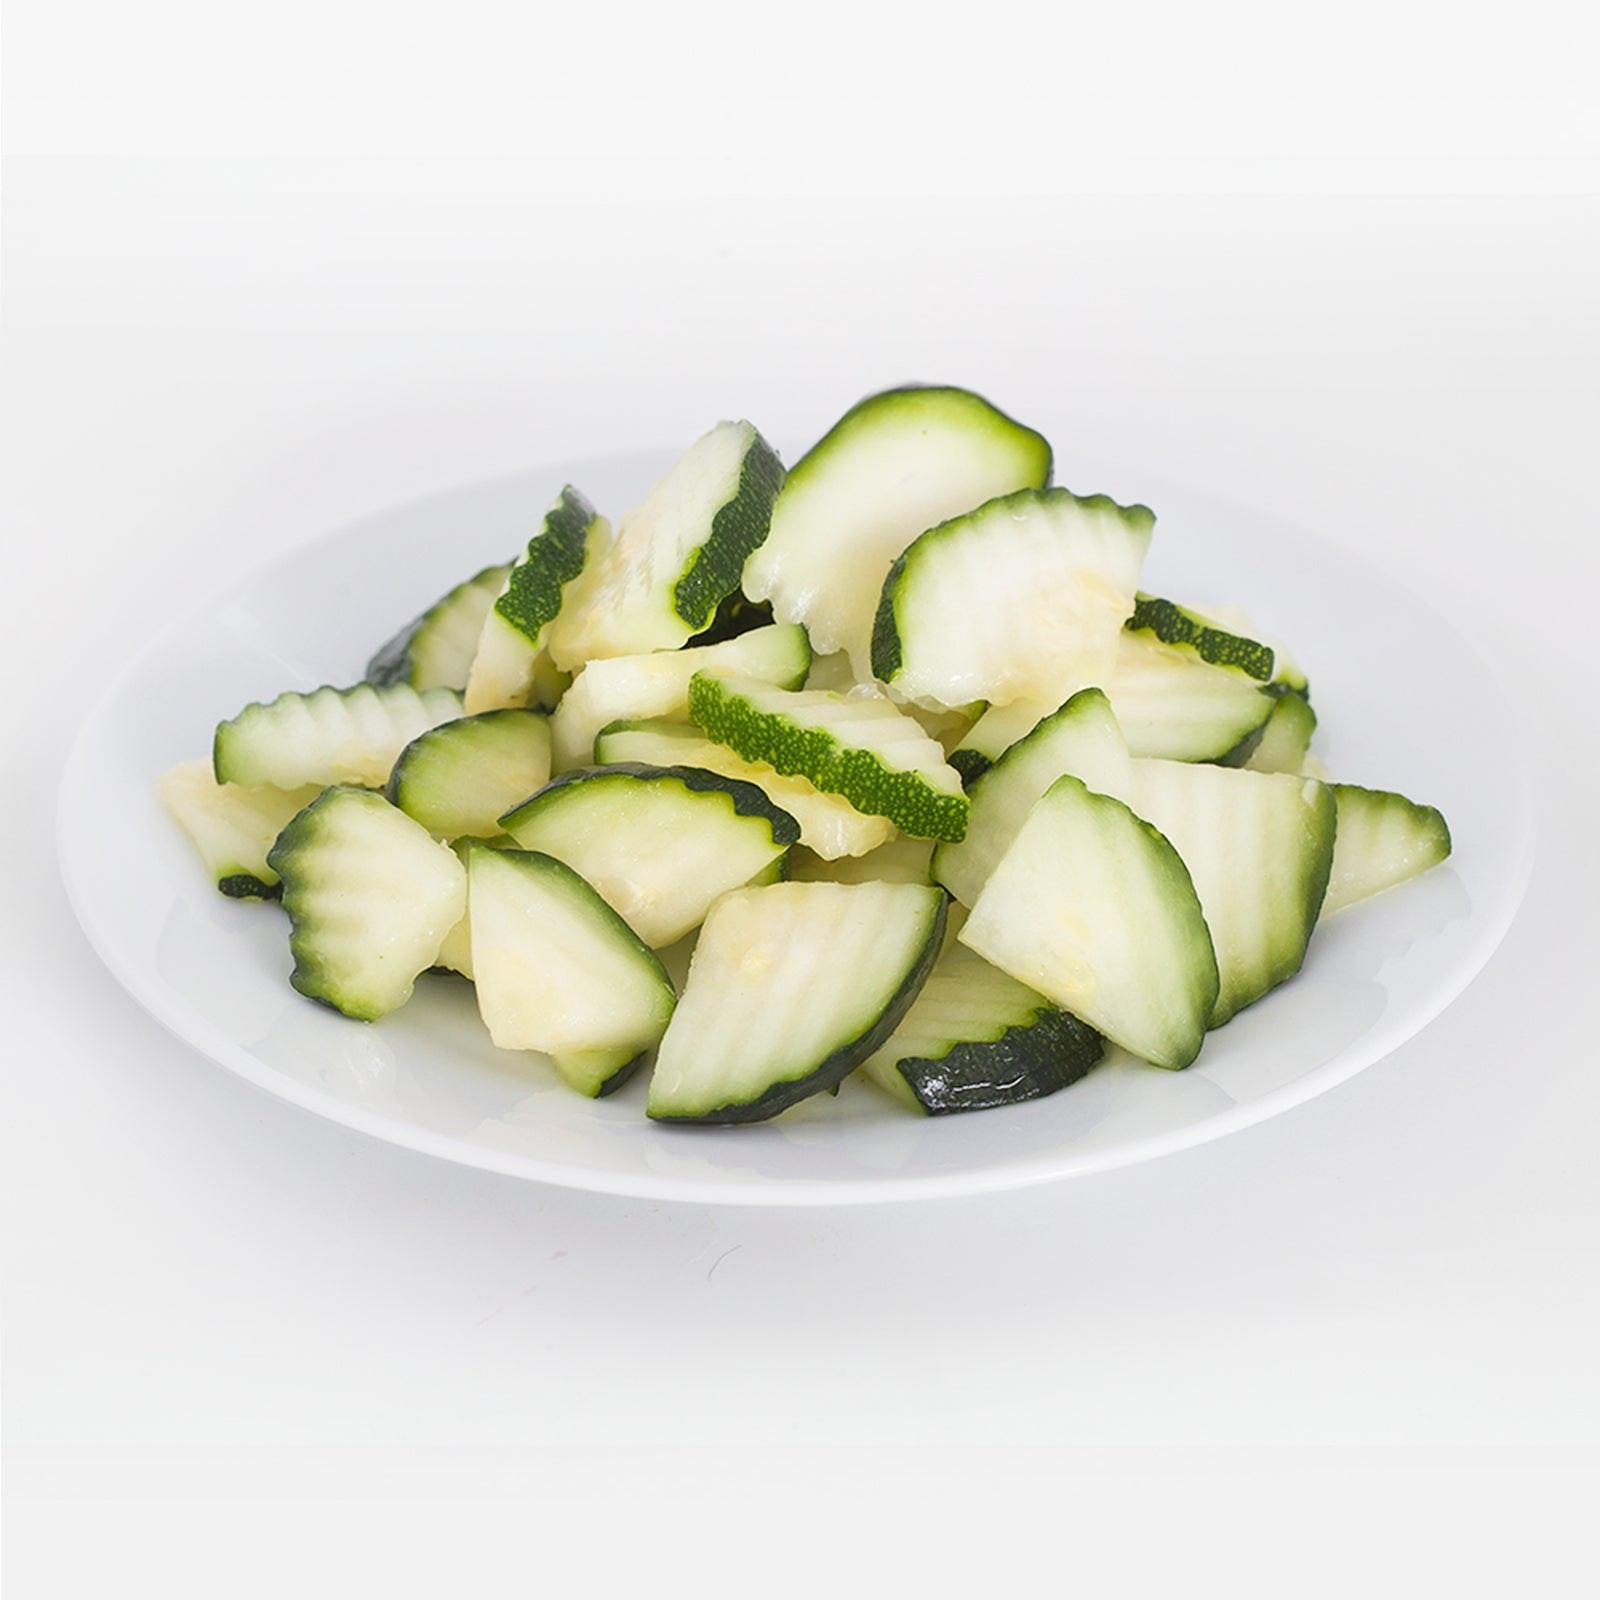 BELOW ZERO Sliced crinkle zucchini